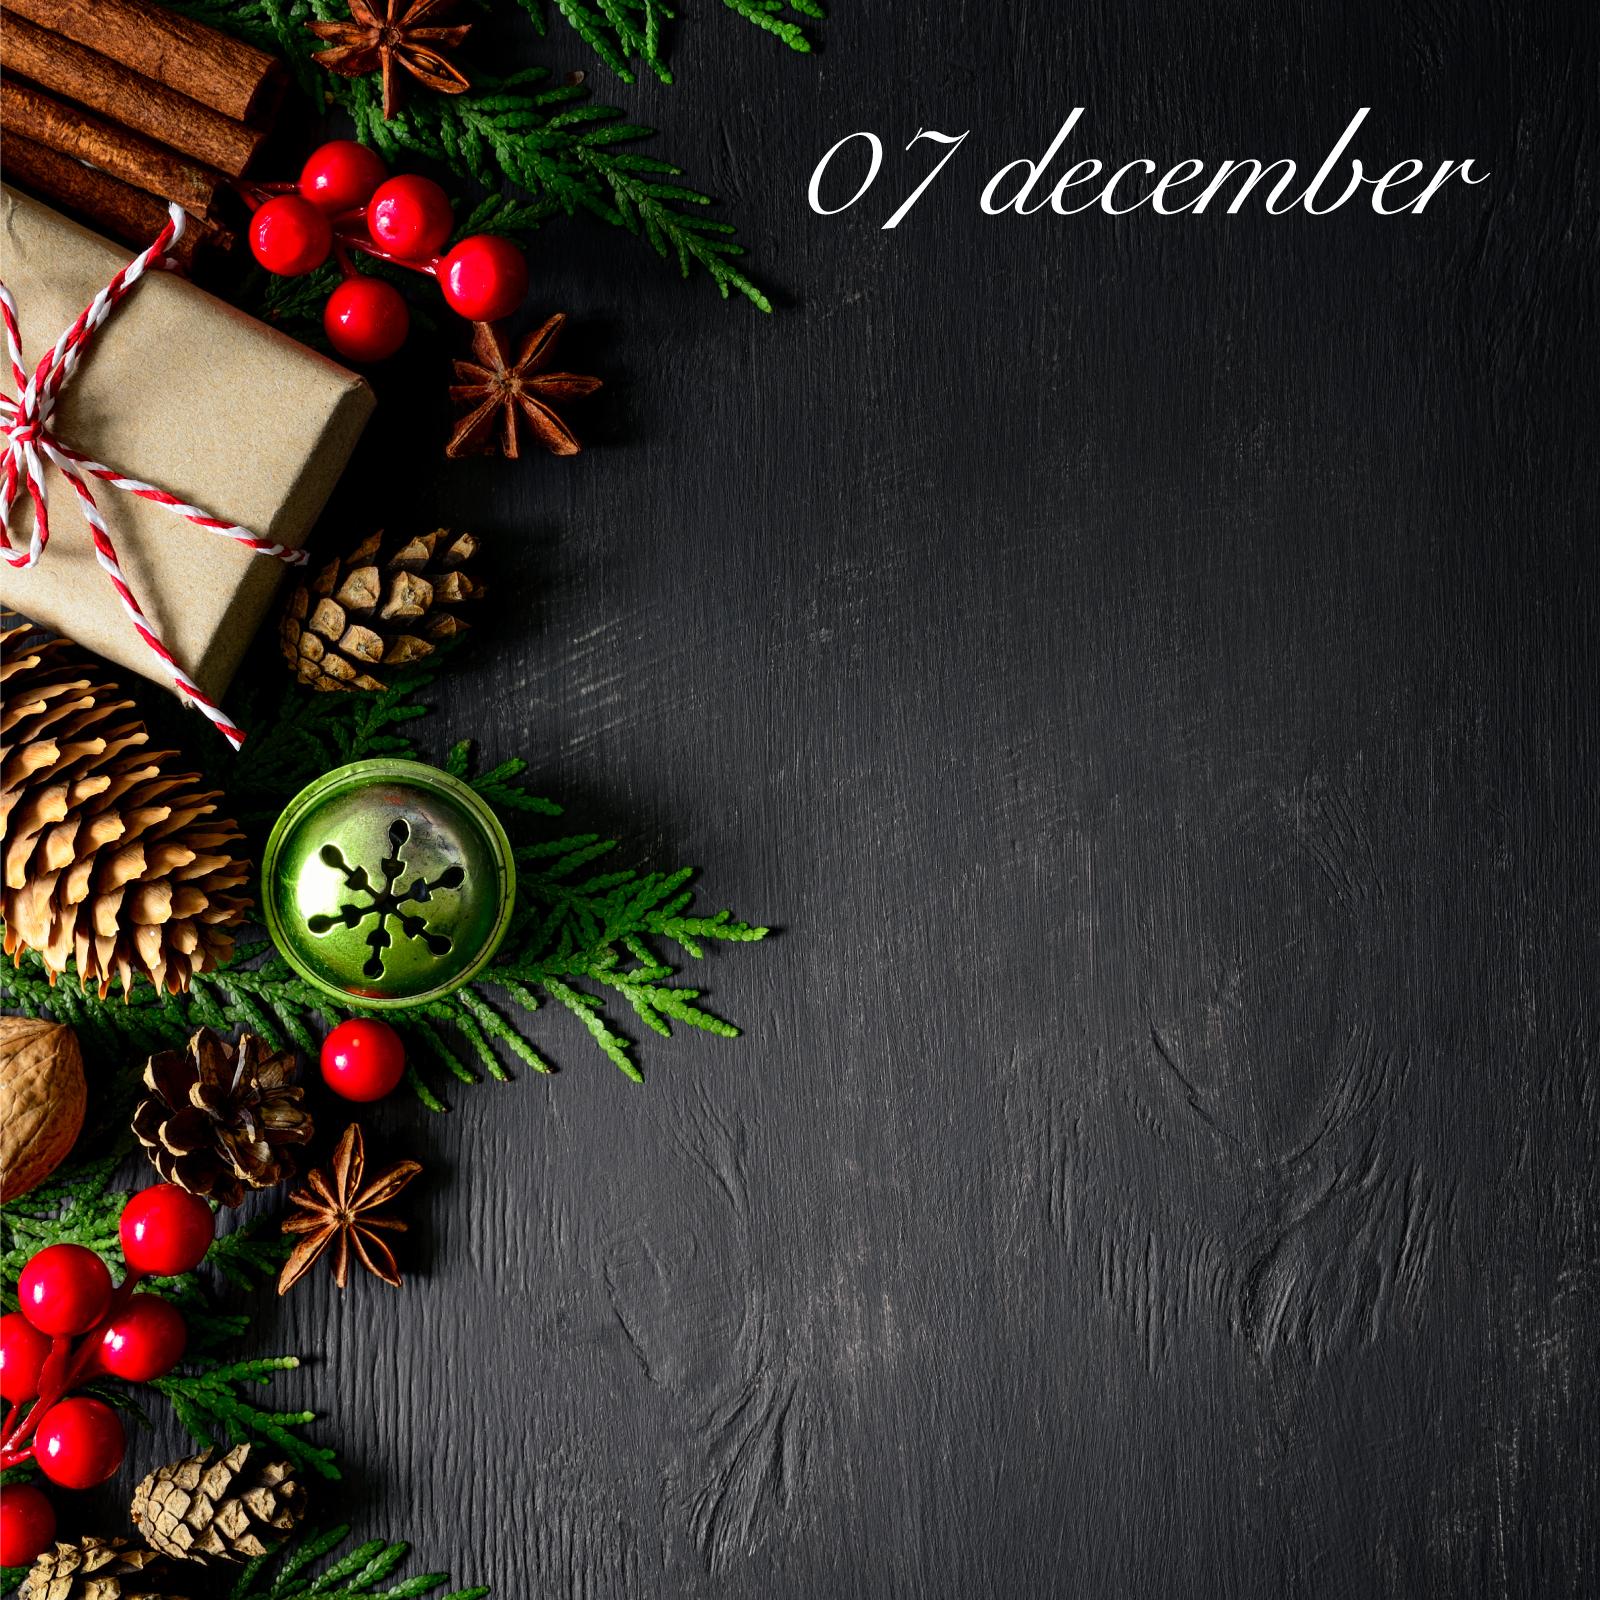 7 december